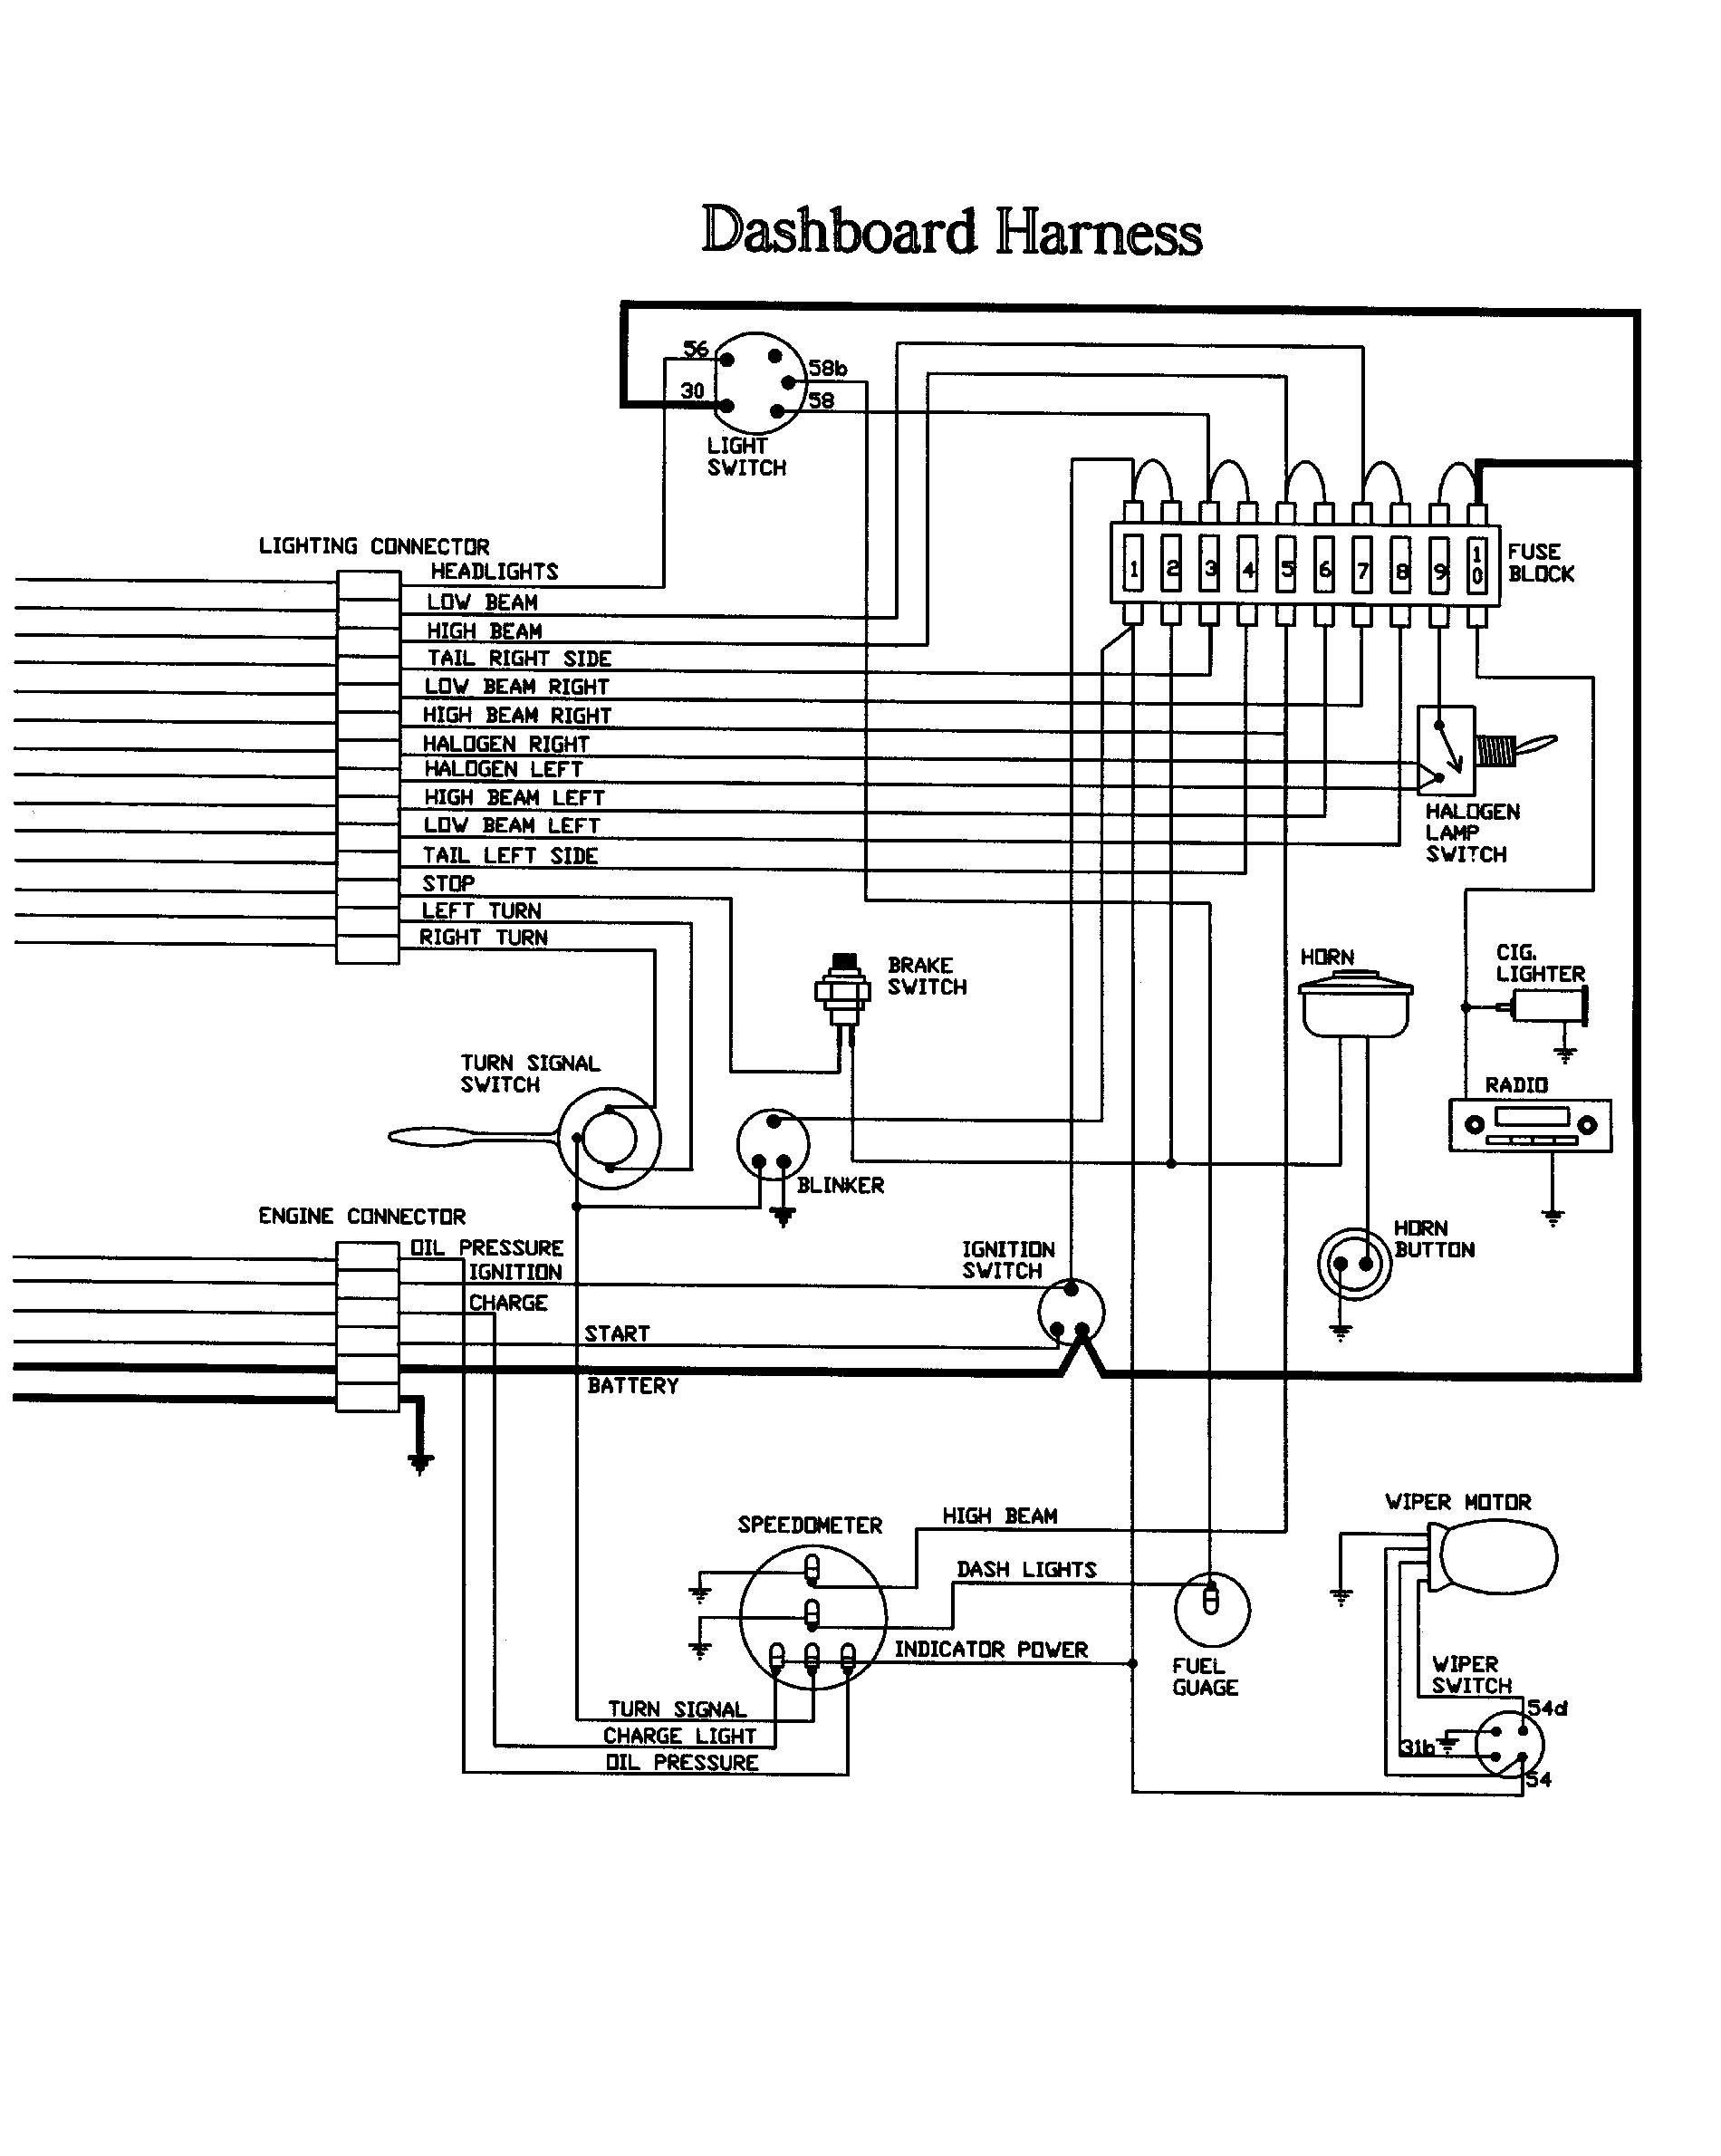 meyer home plow wiring diagram dcc bus diagrams manx aqoq ortholinc de harness 19 stromoeko u2022 rh dune buggy vw